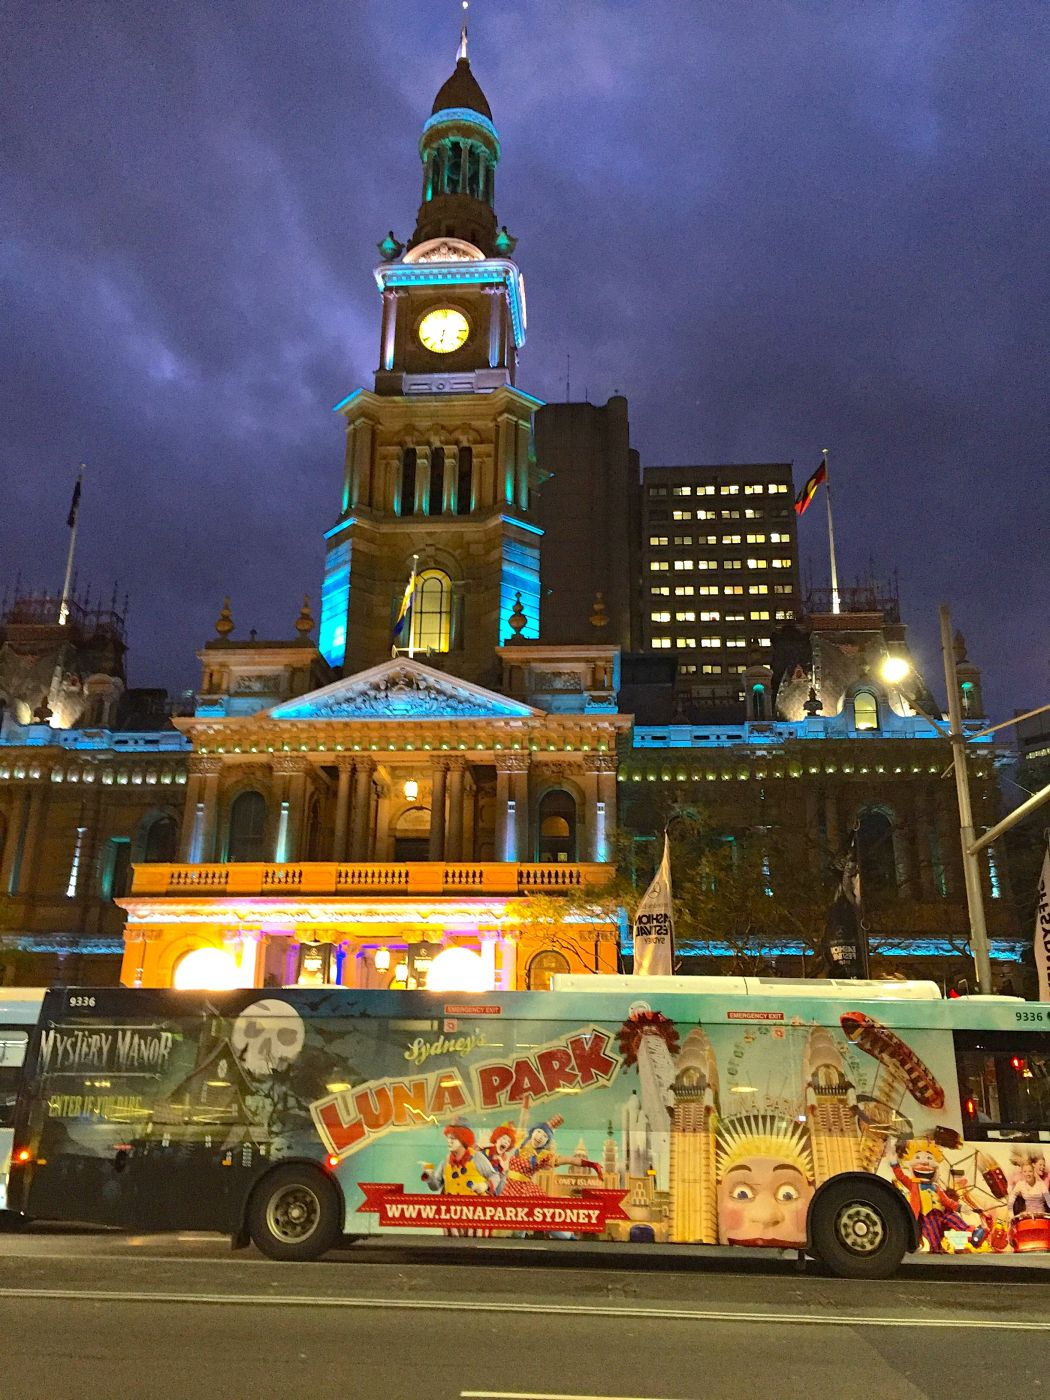 Sydney Town Hall at night, Australia